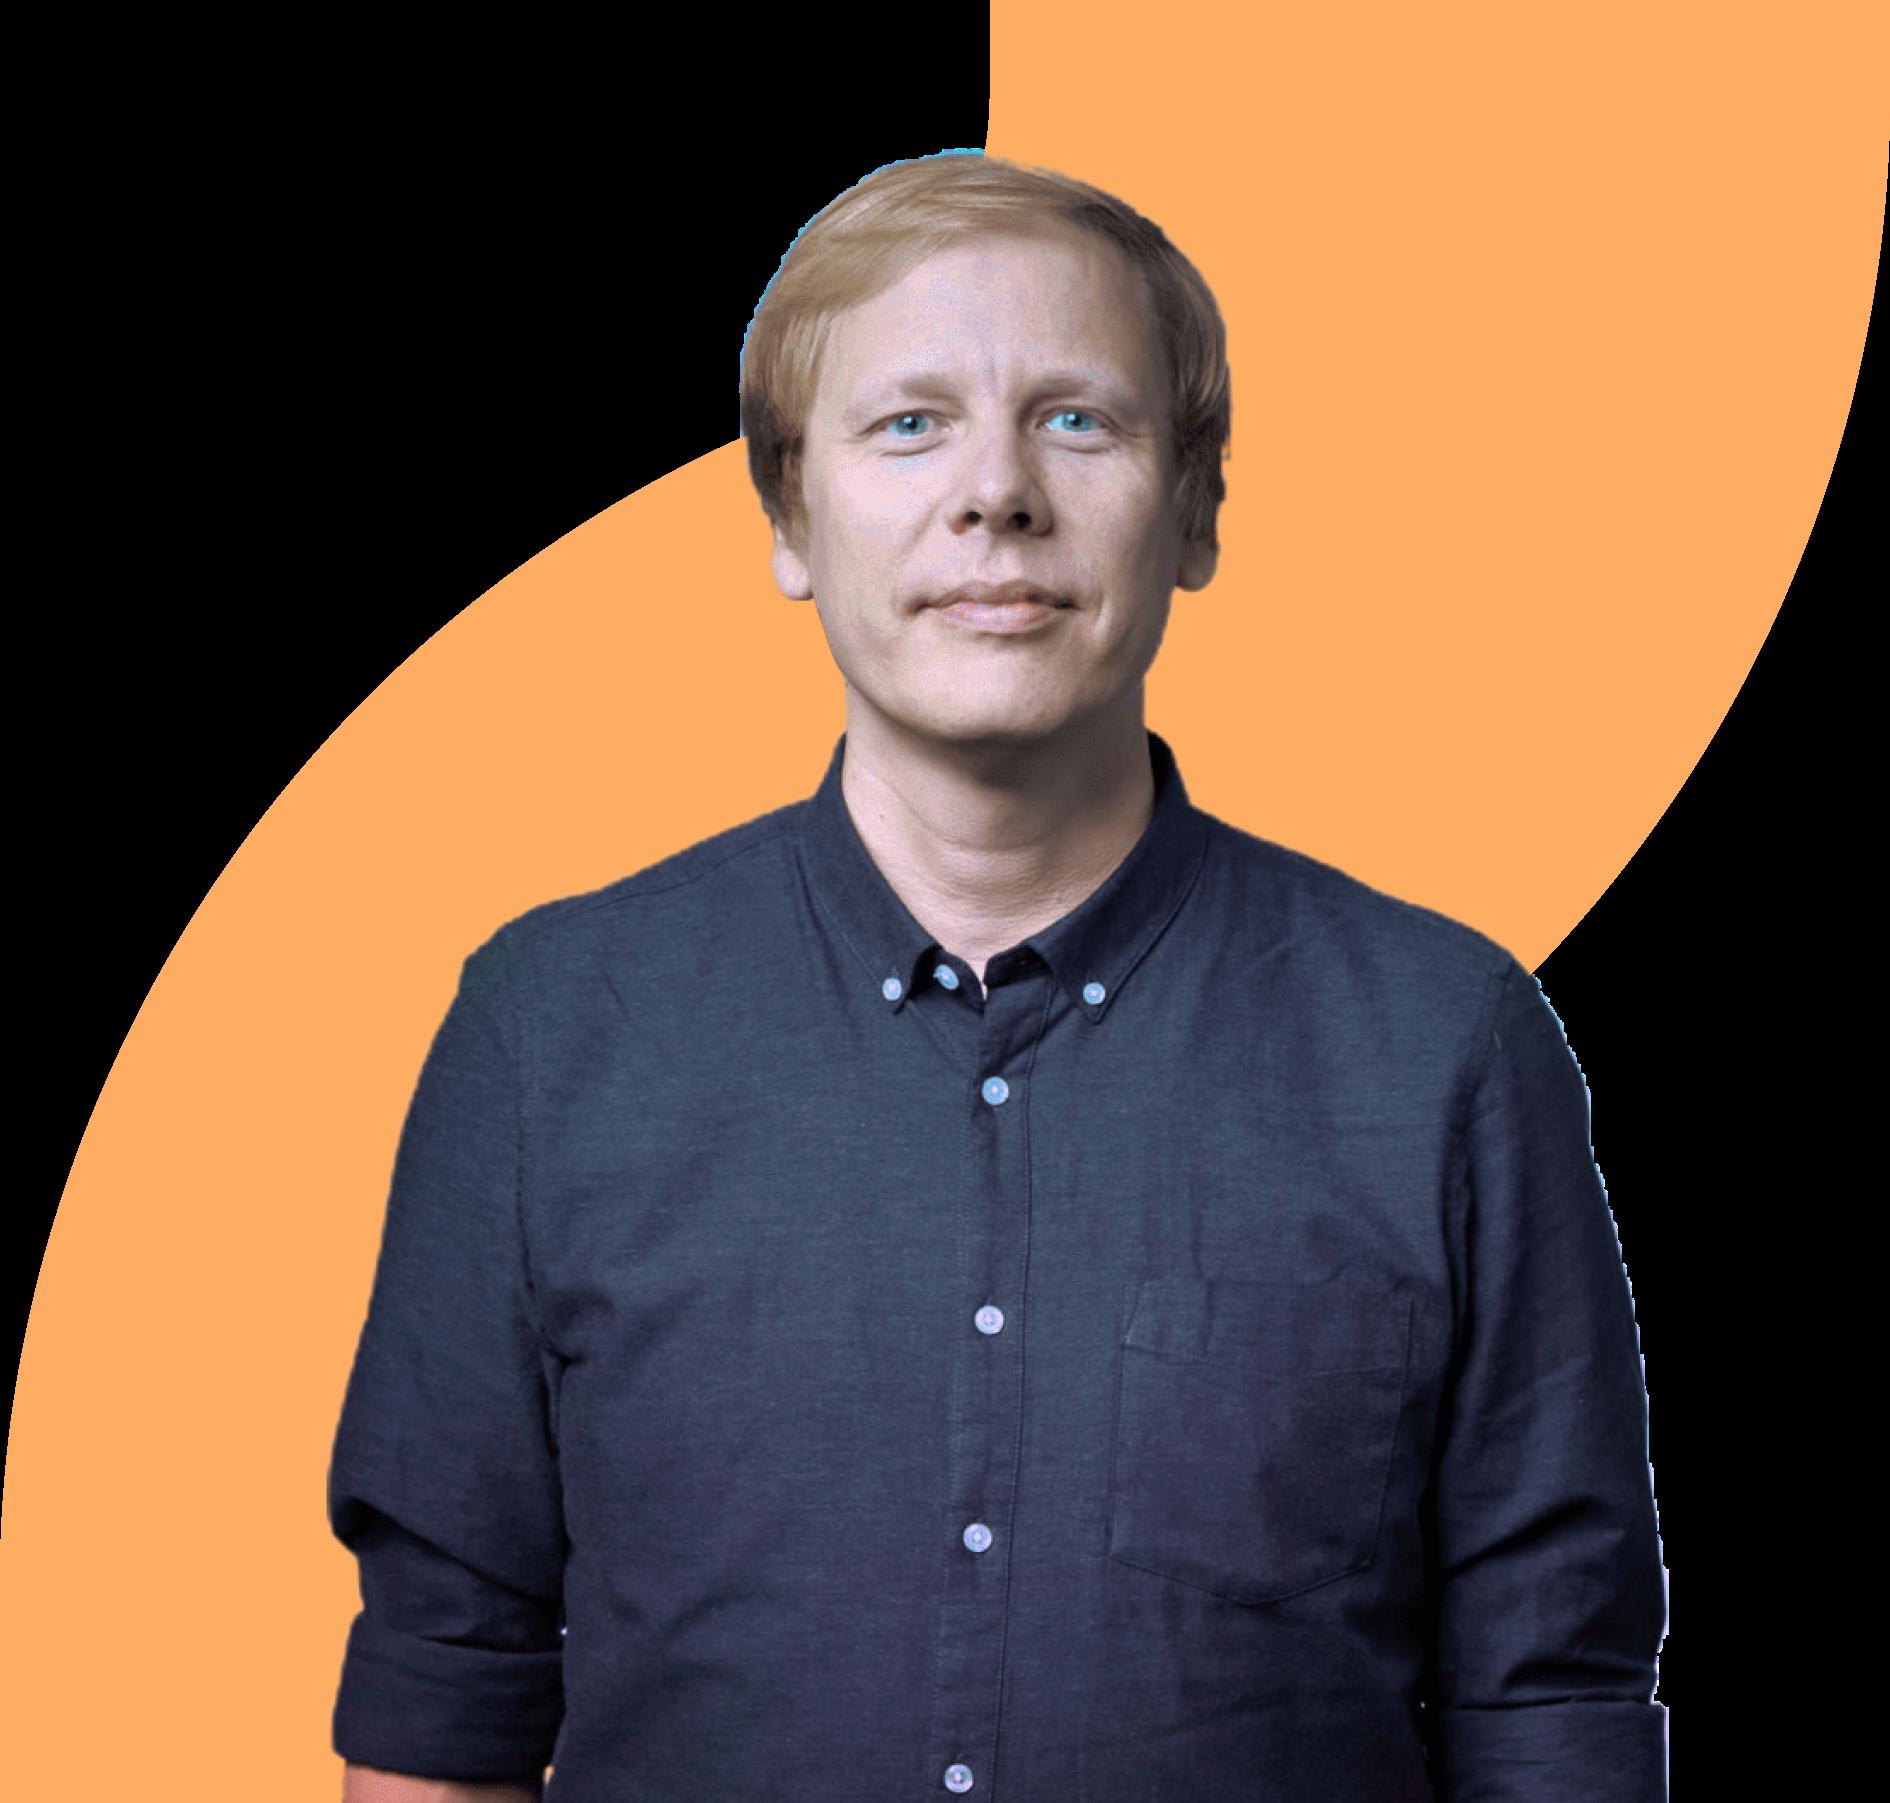 Joakim Schonert, Design Principal, Futurice